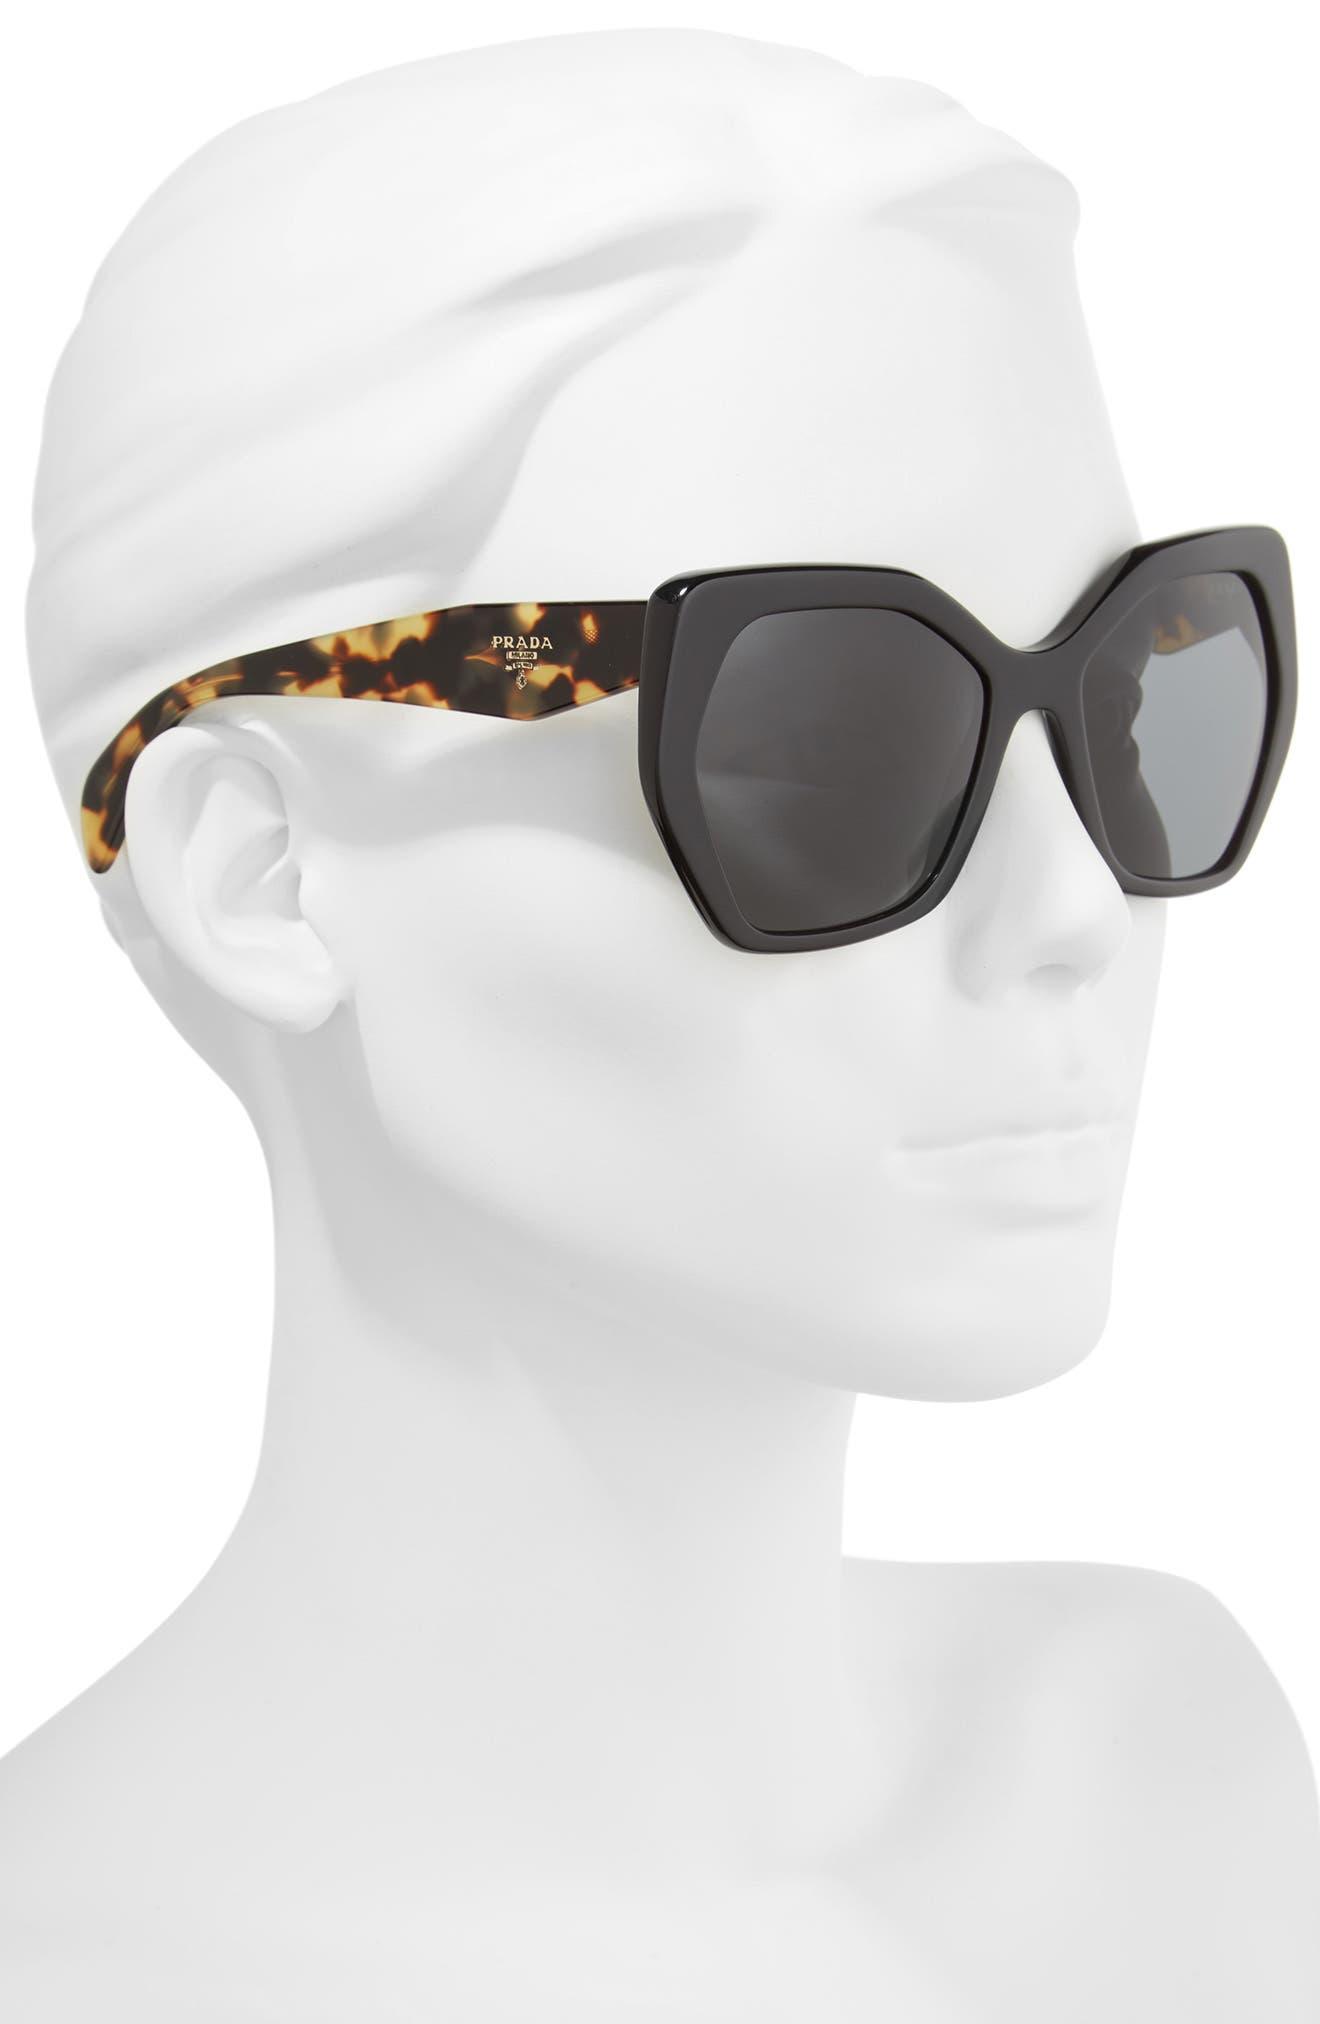 Heritage 56mm Sunglasses,                             Alternate thumbnail 2, color,                             002